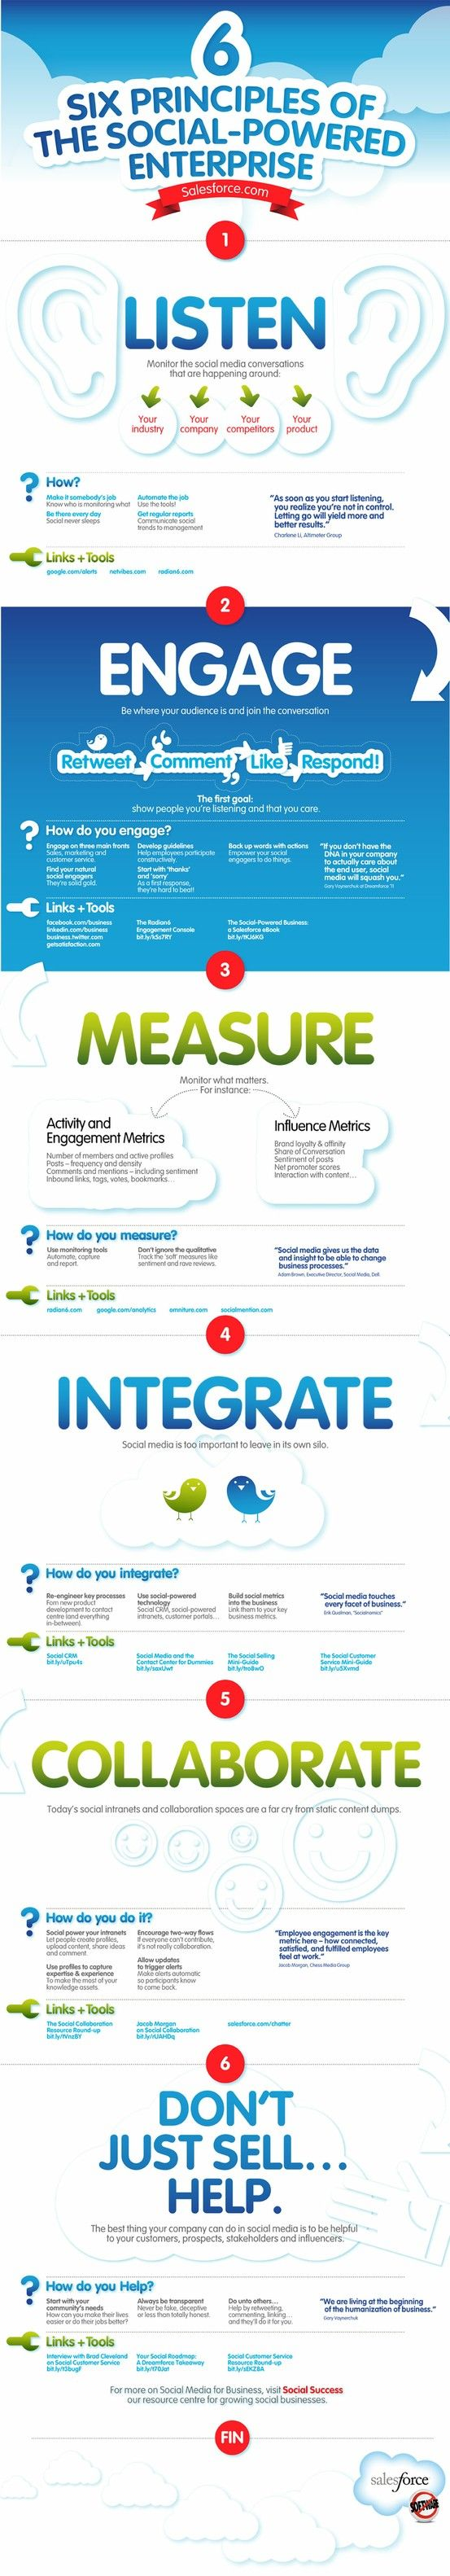 6 social media tips from Salesforce.